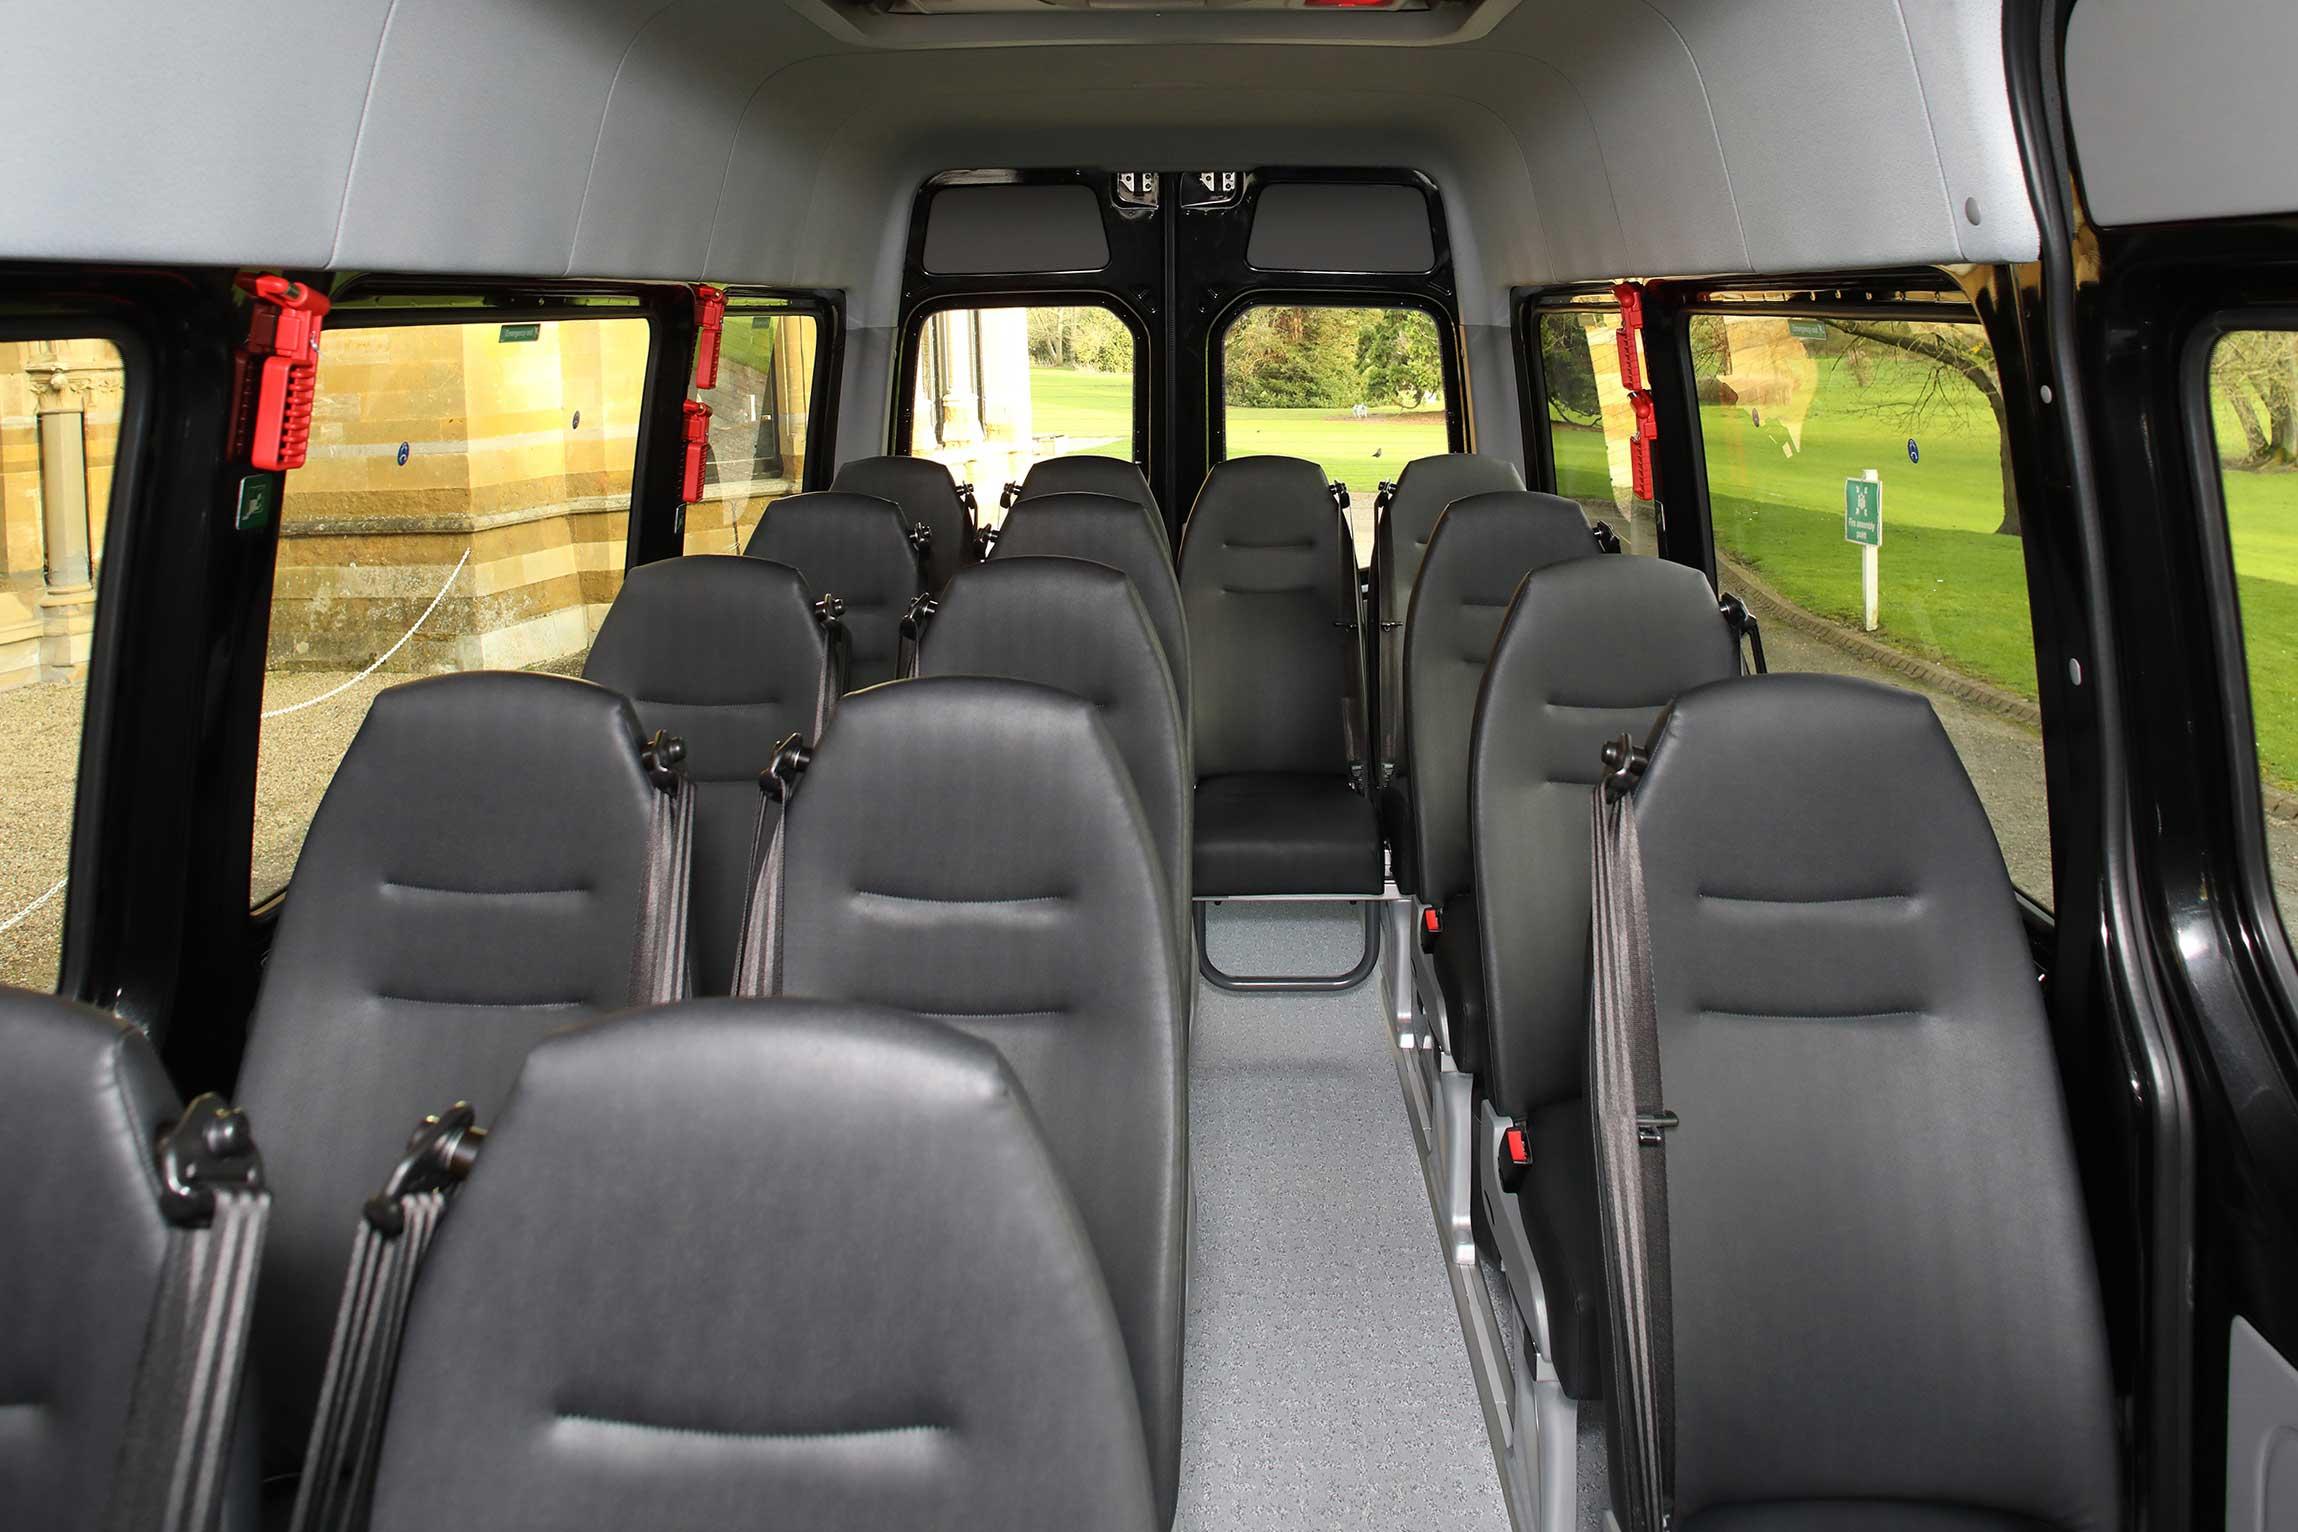 Mercedes-Benz minibus